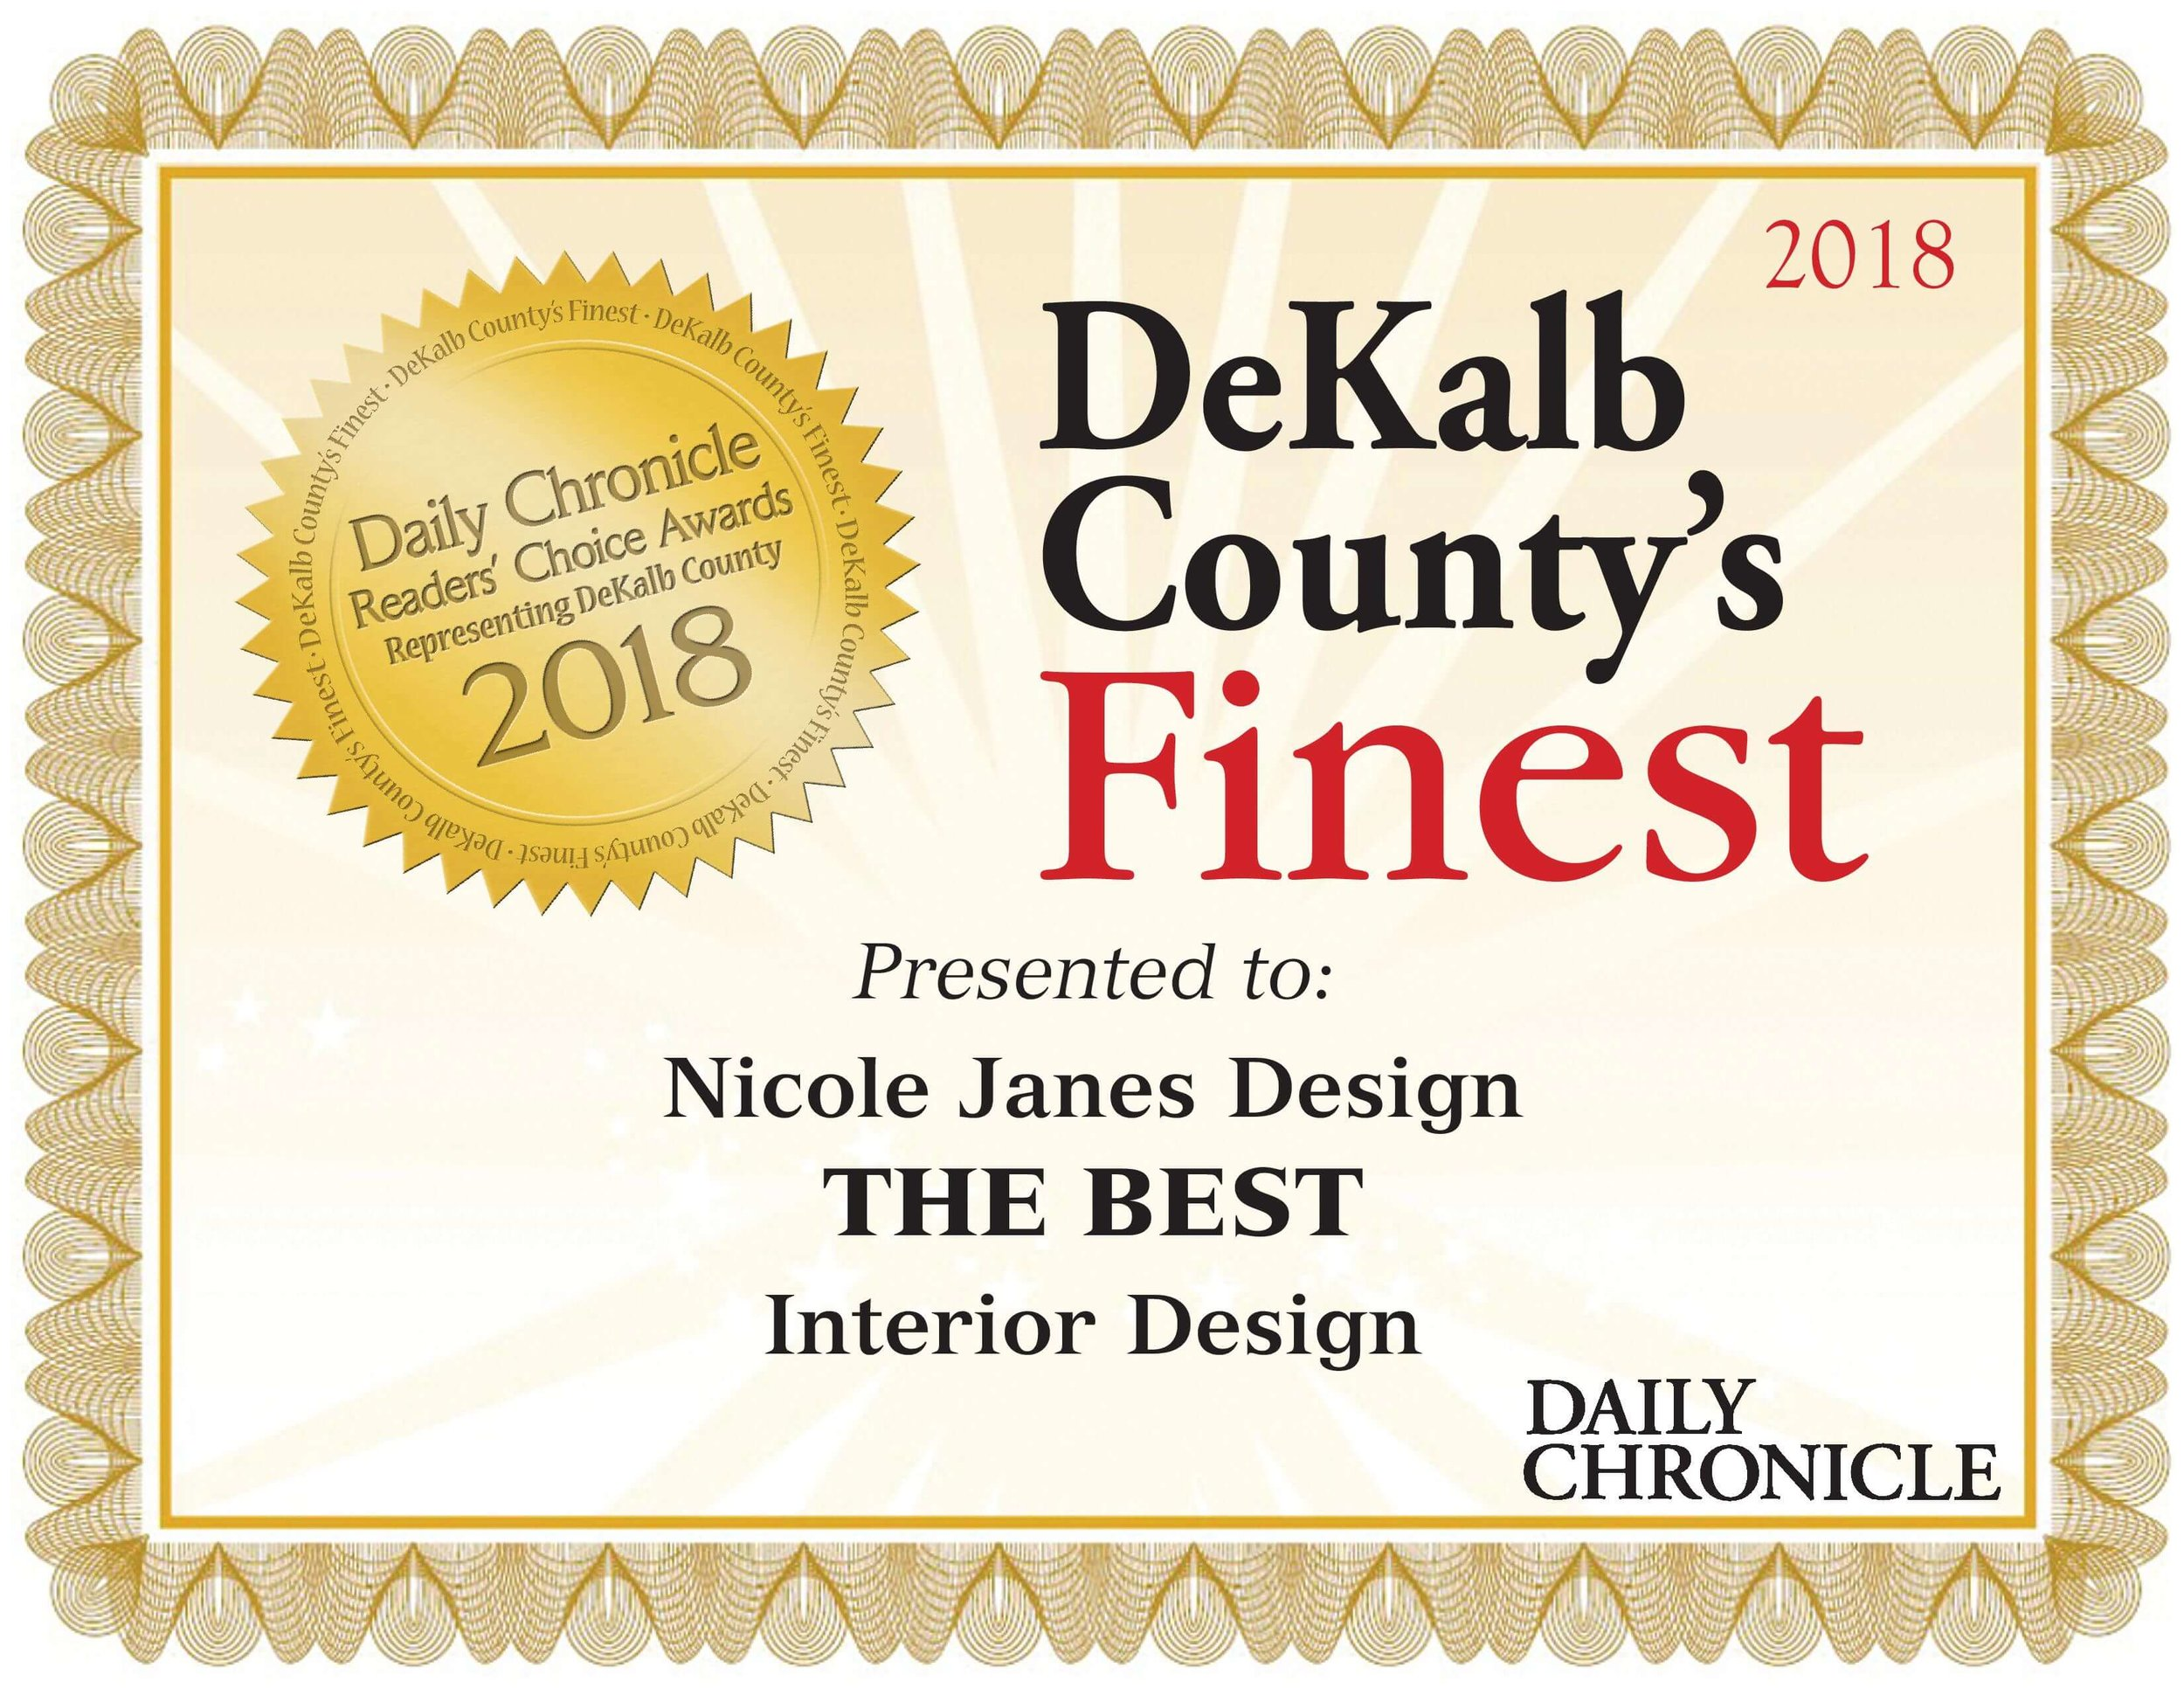 Nicole Janes Design 2018 Dekalb Countys Finest Interior Design Award.jpg